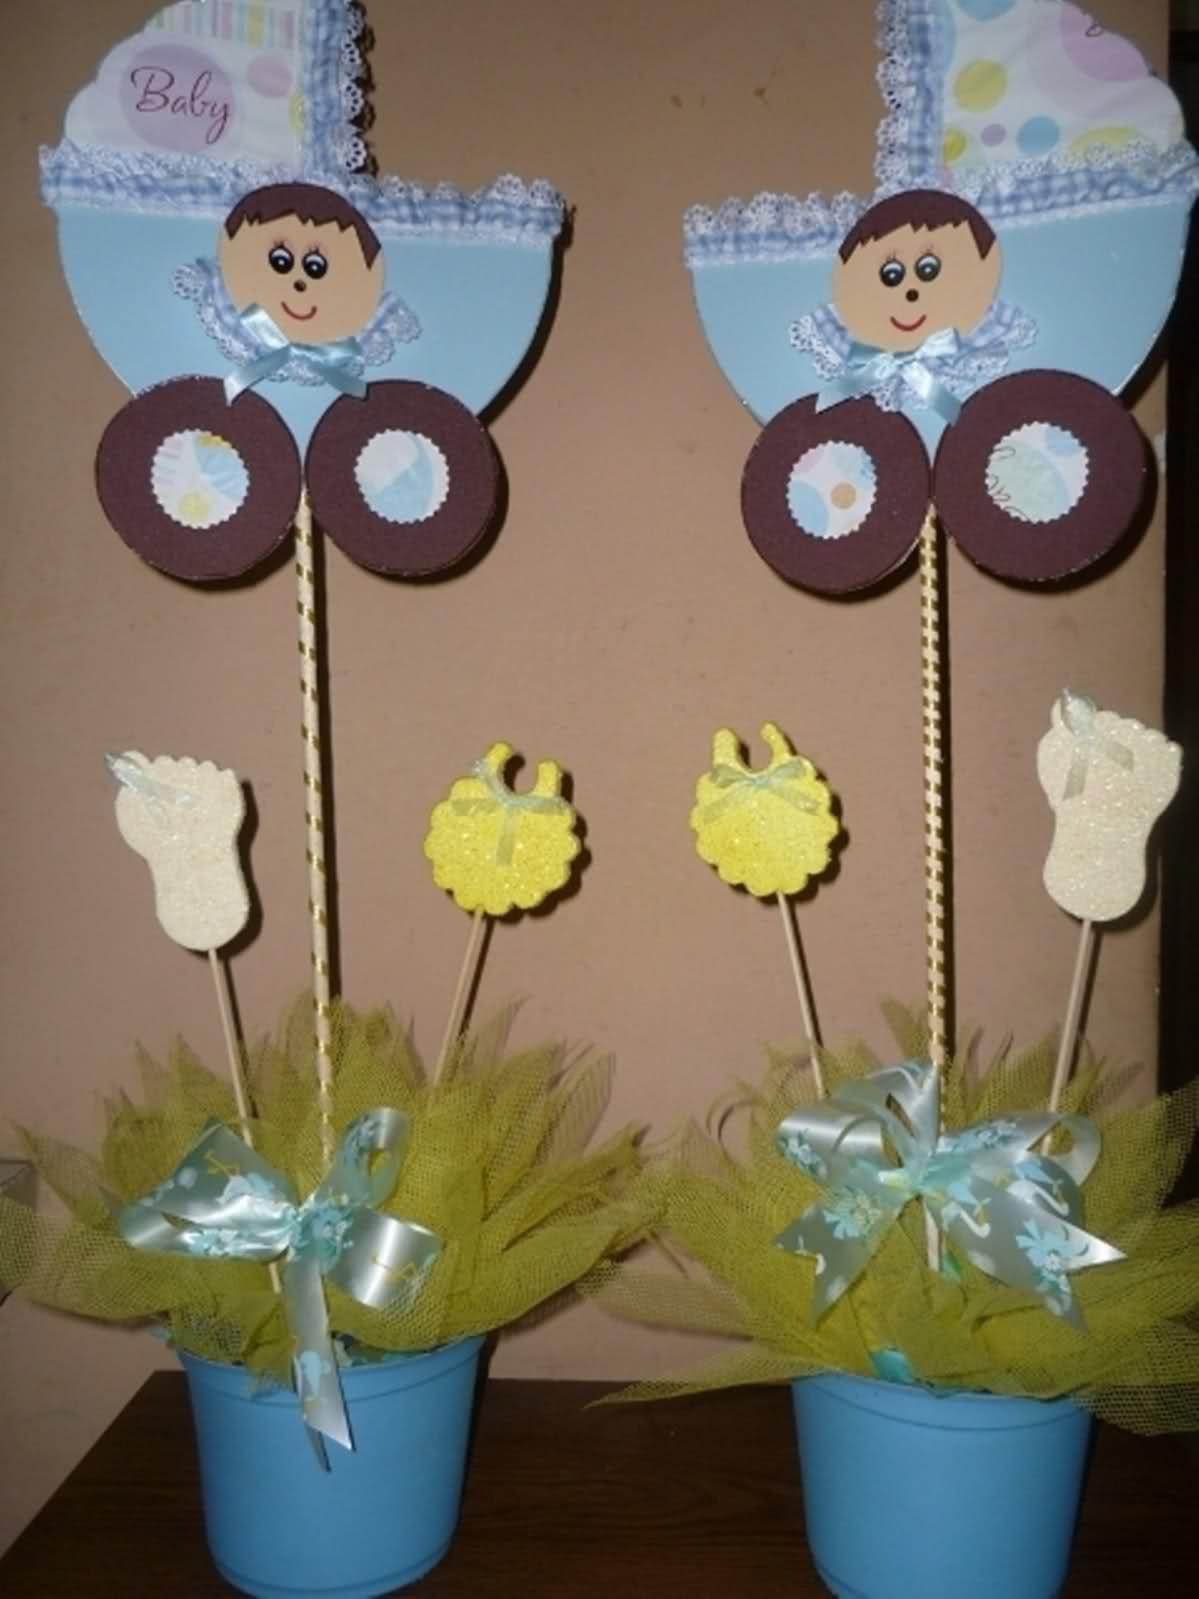 Mesas De Baby Shower Sencillas : mesas, shower, sencillas, Centro, Sencillos, Shower, Mesas, Shower,, Temas, Niño,, Infantil